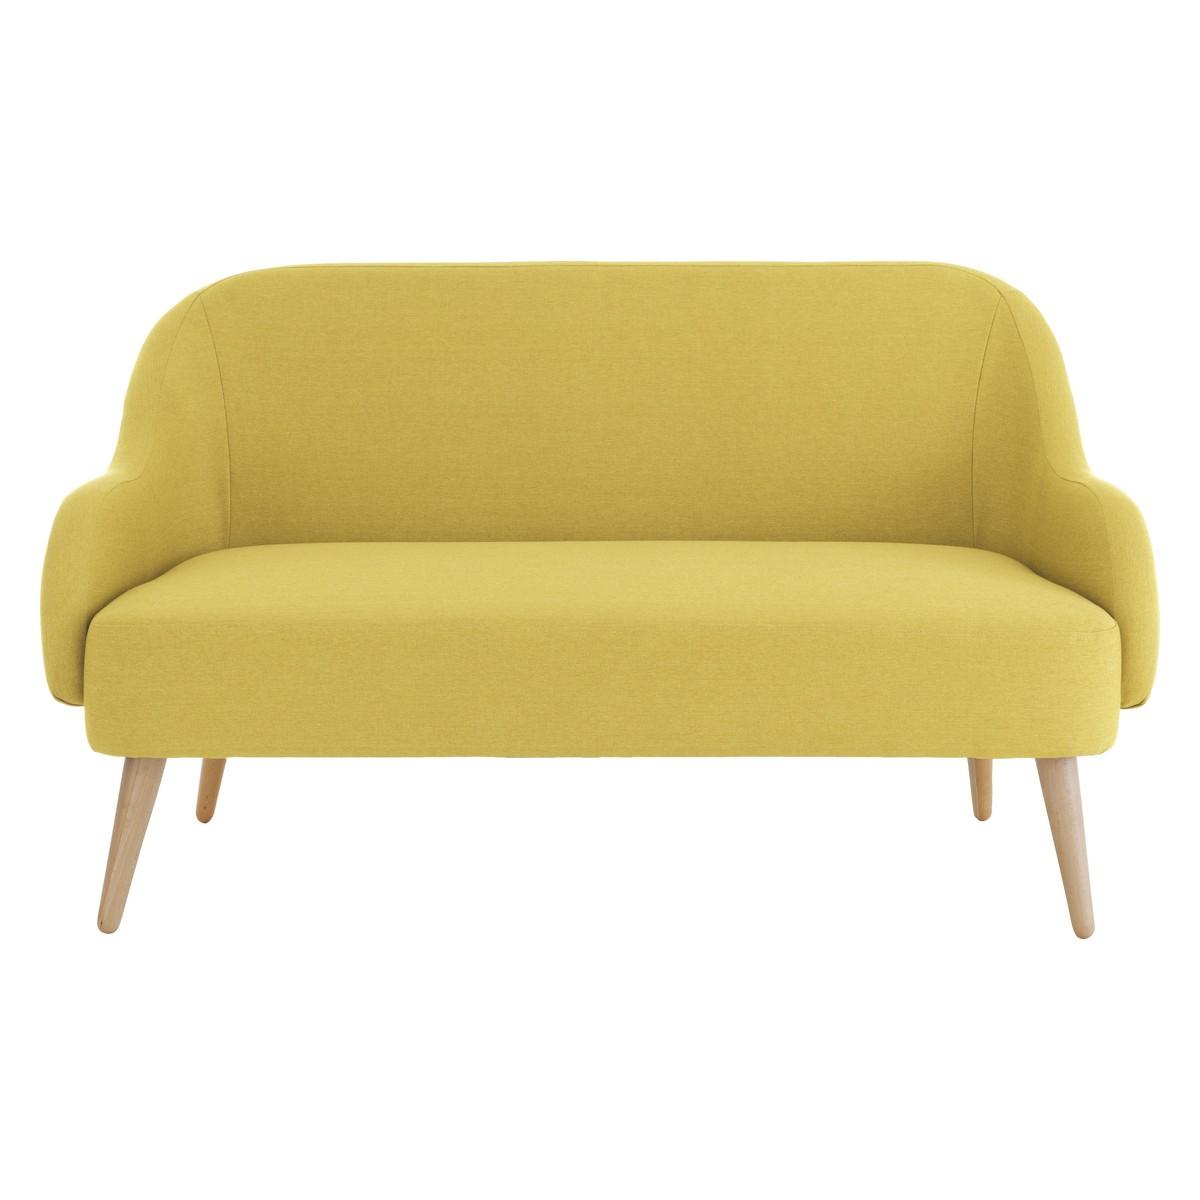 momo saffron yellow fabric 2